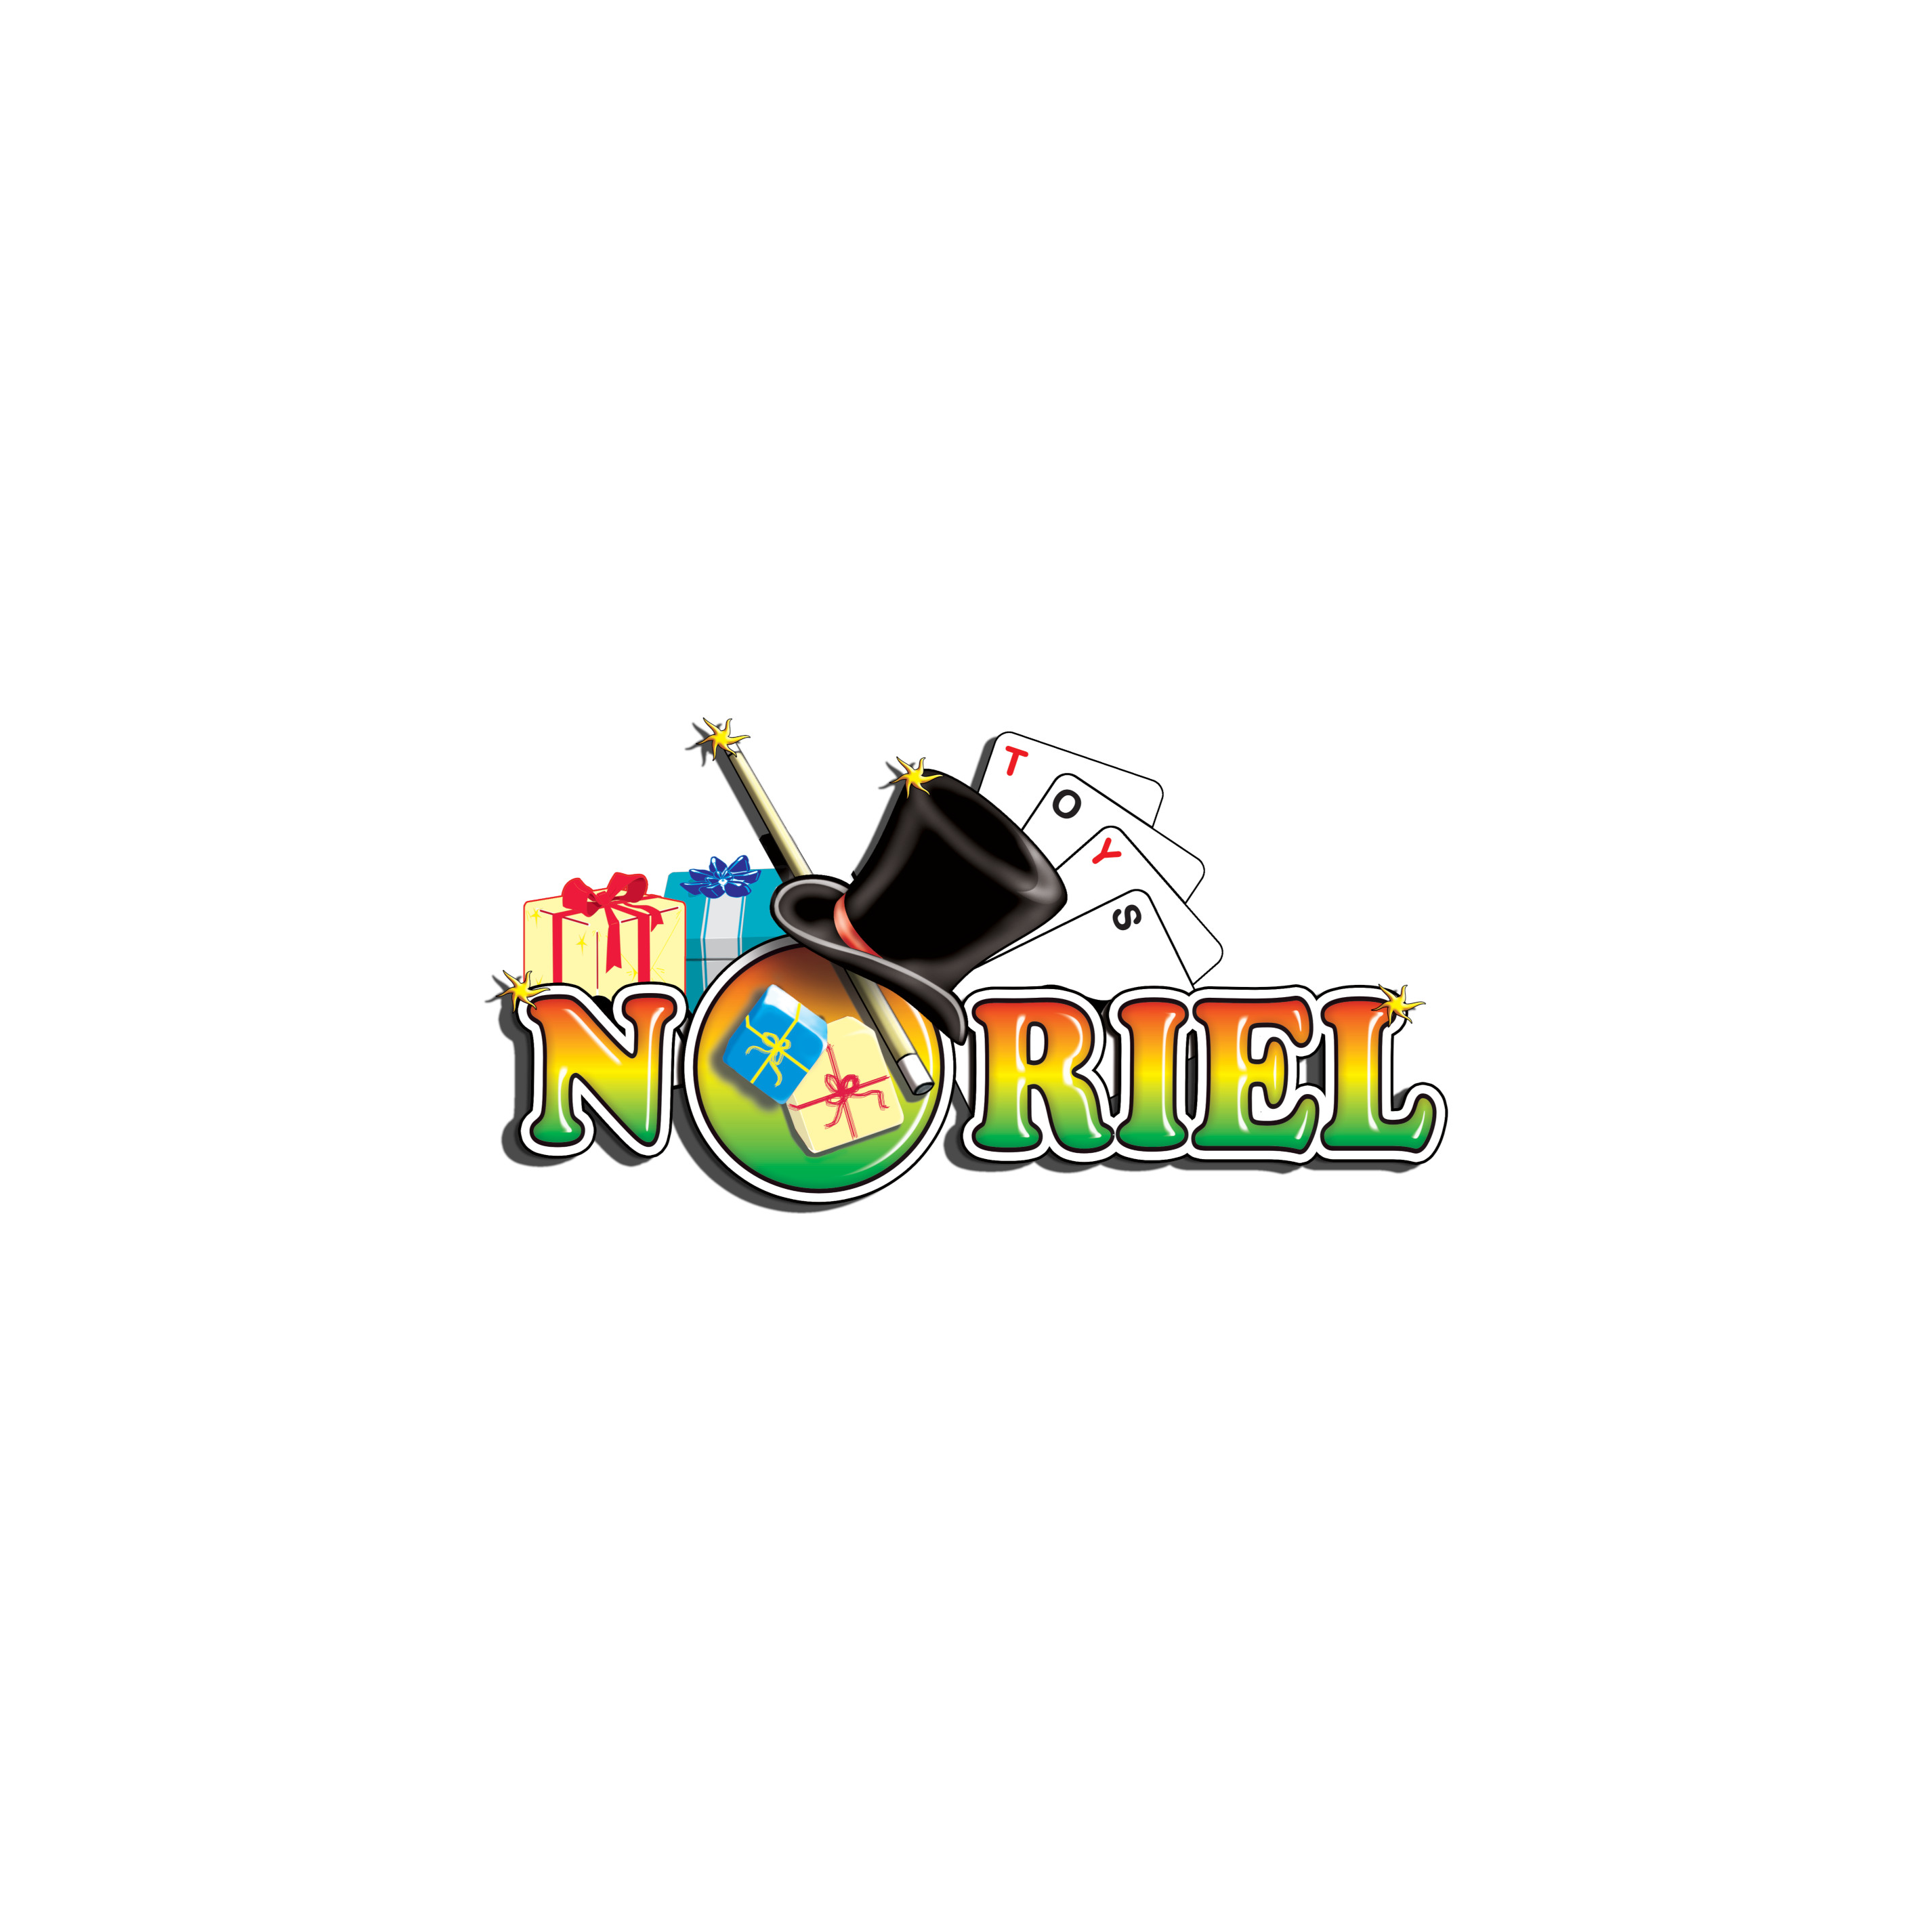 DOLU3023_001w Ansamblu de joaca pentru copii 4 in 1 Dolu